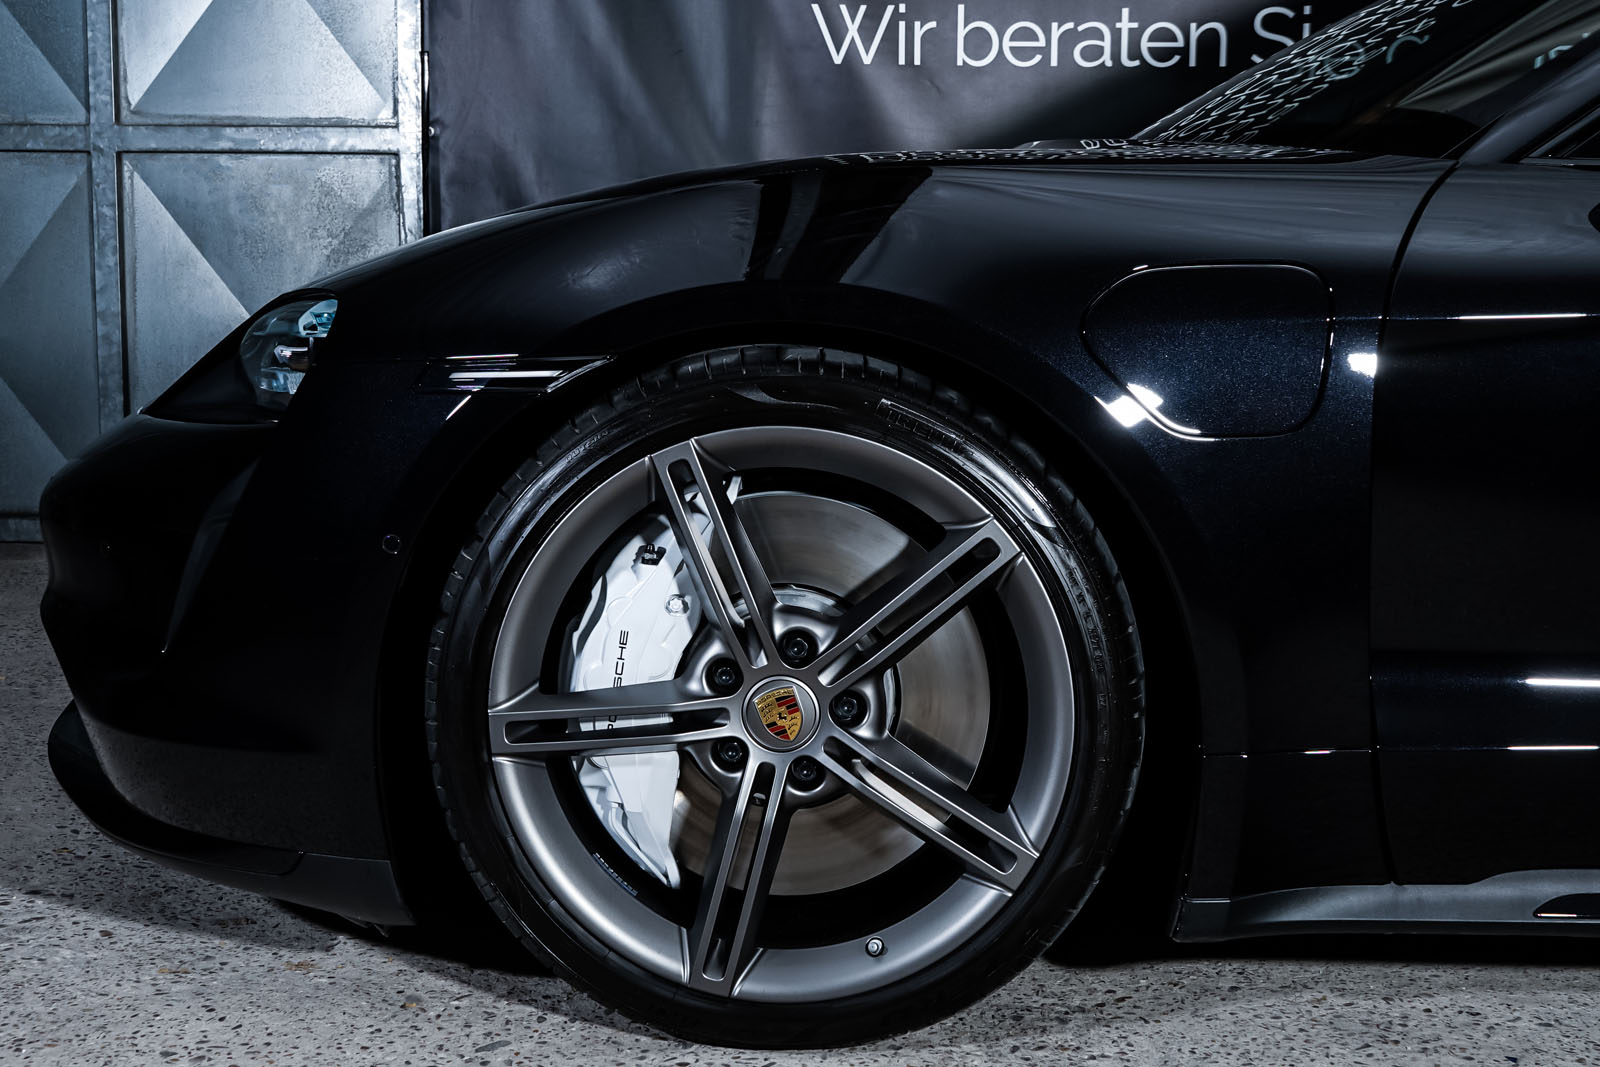 Porsche_Taycan_Turbo_Schwarz_Schwarz_POR-8106_3_w